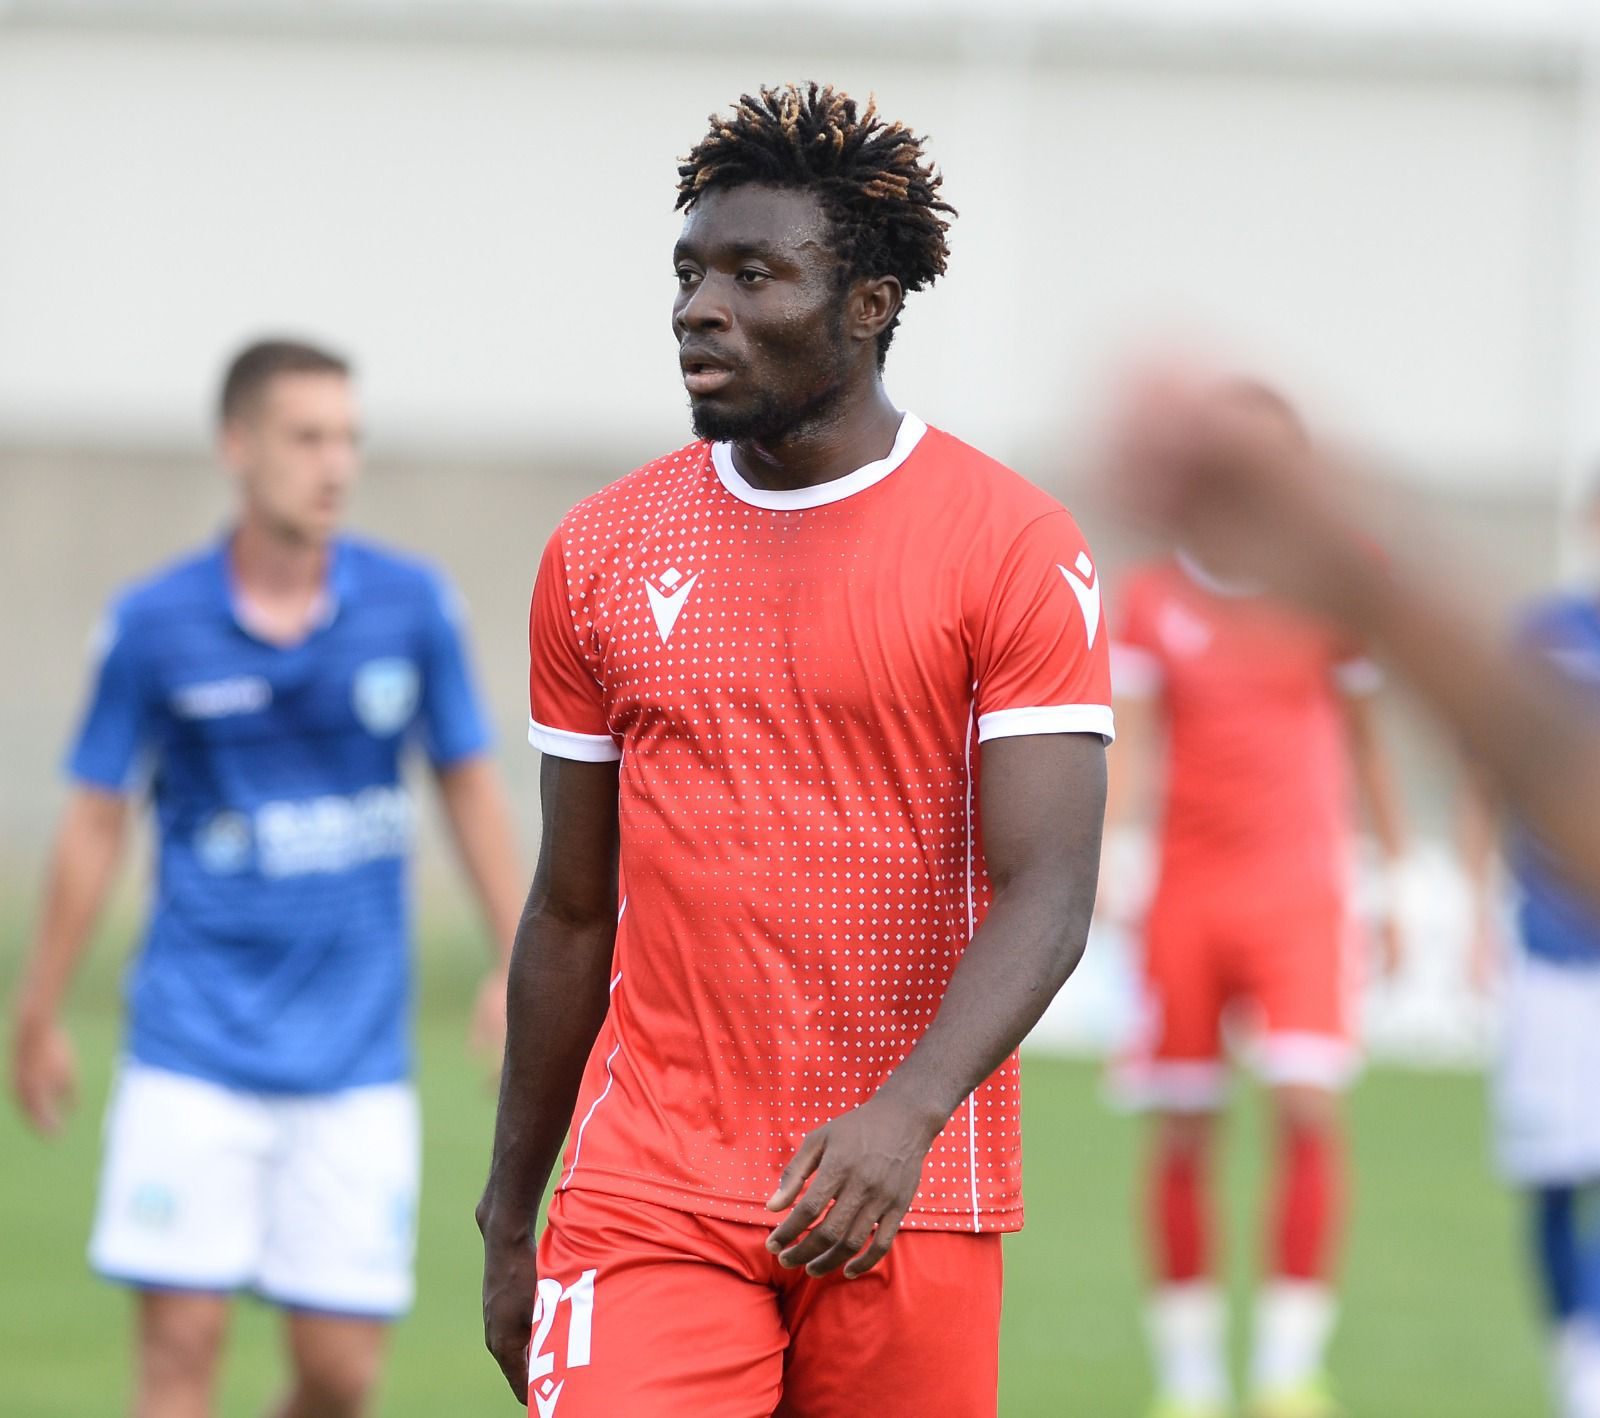 Ghanaian youngster Ibrahim Mustapha scores as Radnicki Mitrovica lose to Kabel in Serbia Prva Liga